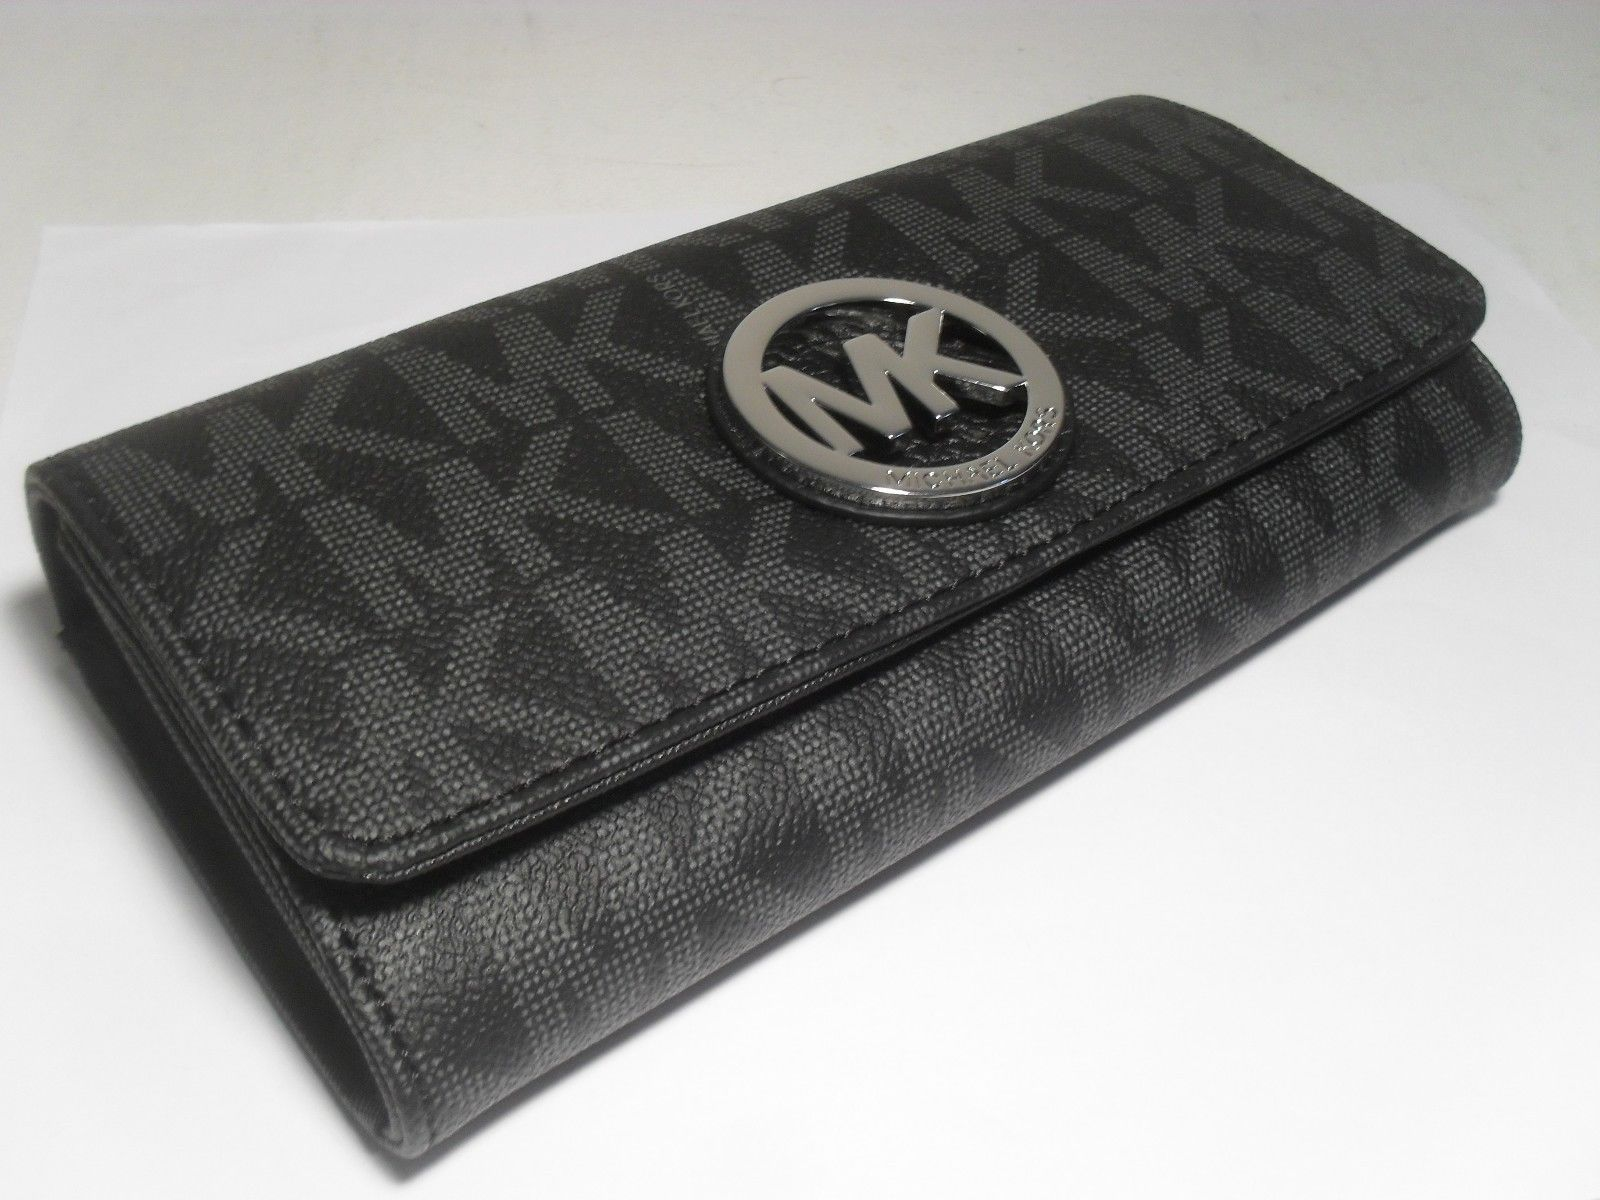 ef295abd80bacc NWT Michael Kors Black PVC MK Signature Fulton Flap Continental Carryall  Wallet